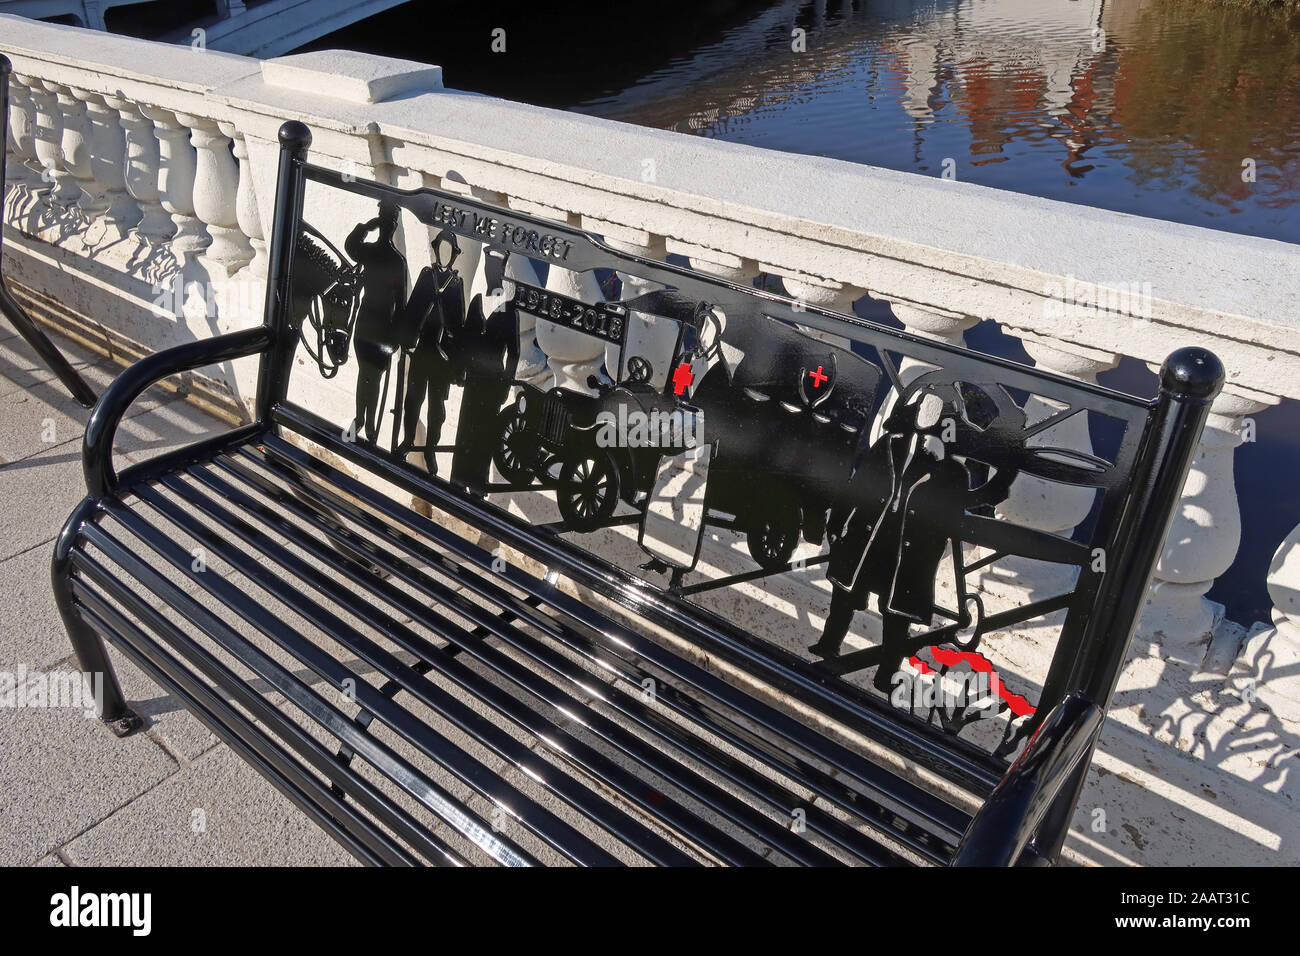 HotpixUk,@HotpixUK,GoTonySmith,UK,England,English,River Mersey Crossing,at,bridges,crossing,Mersey,Cheshire,WA1 1WA,WA1,North West,Bridge Foot,Warrington Bridge,bench,benches,walkway,balcony